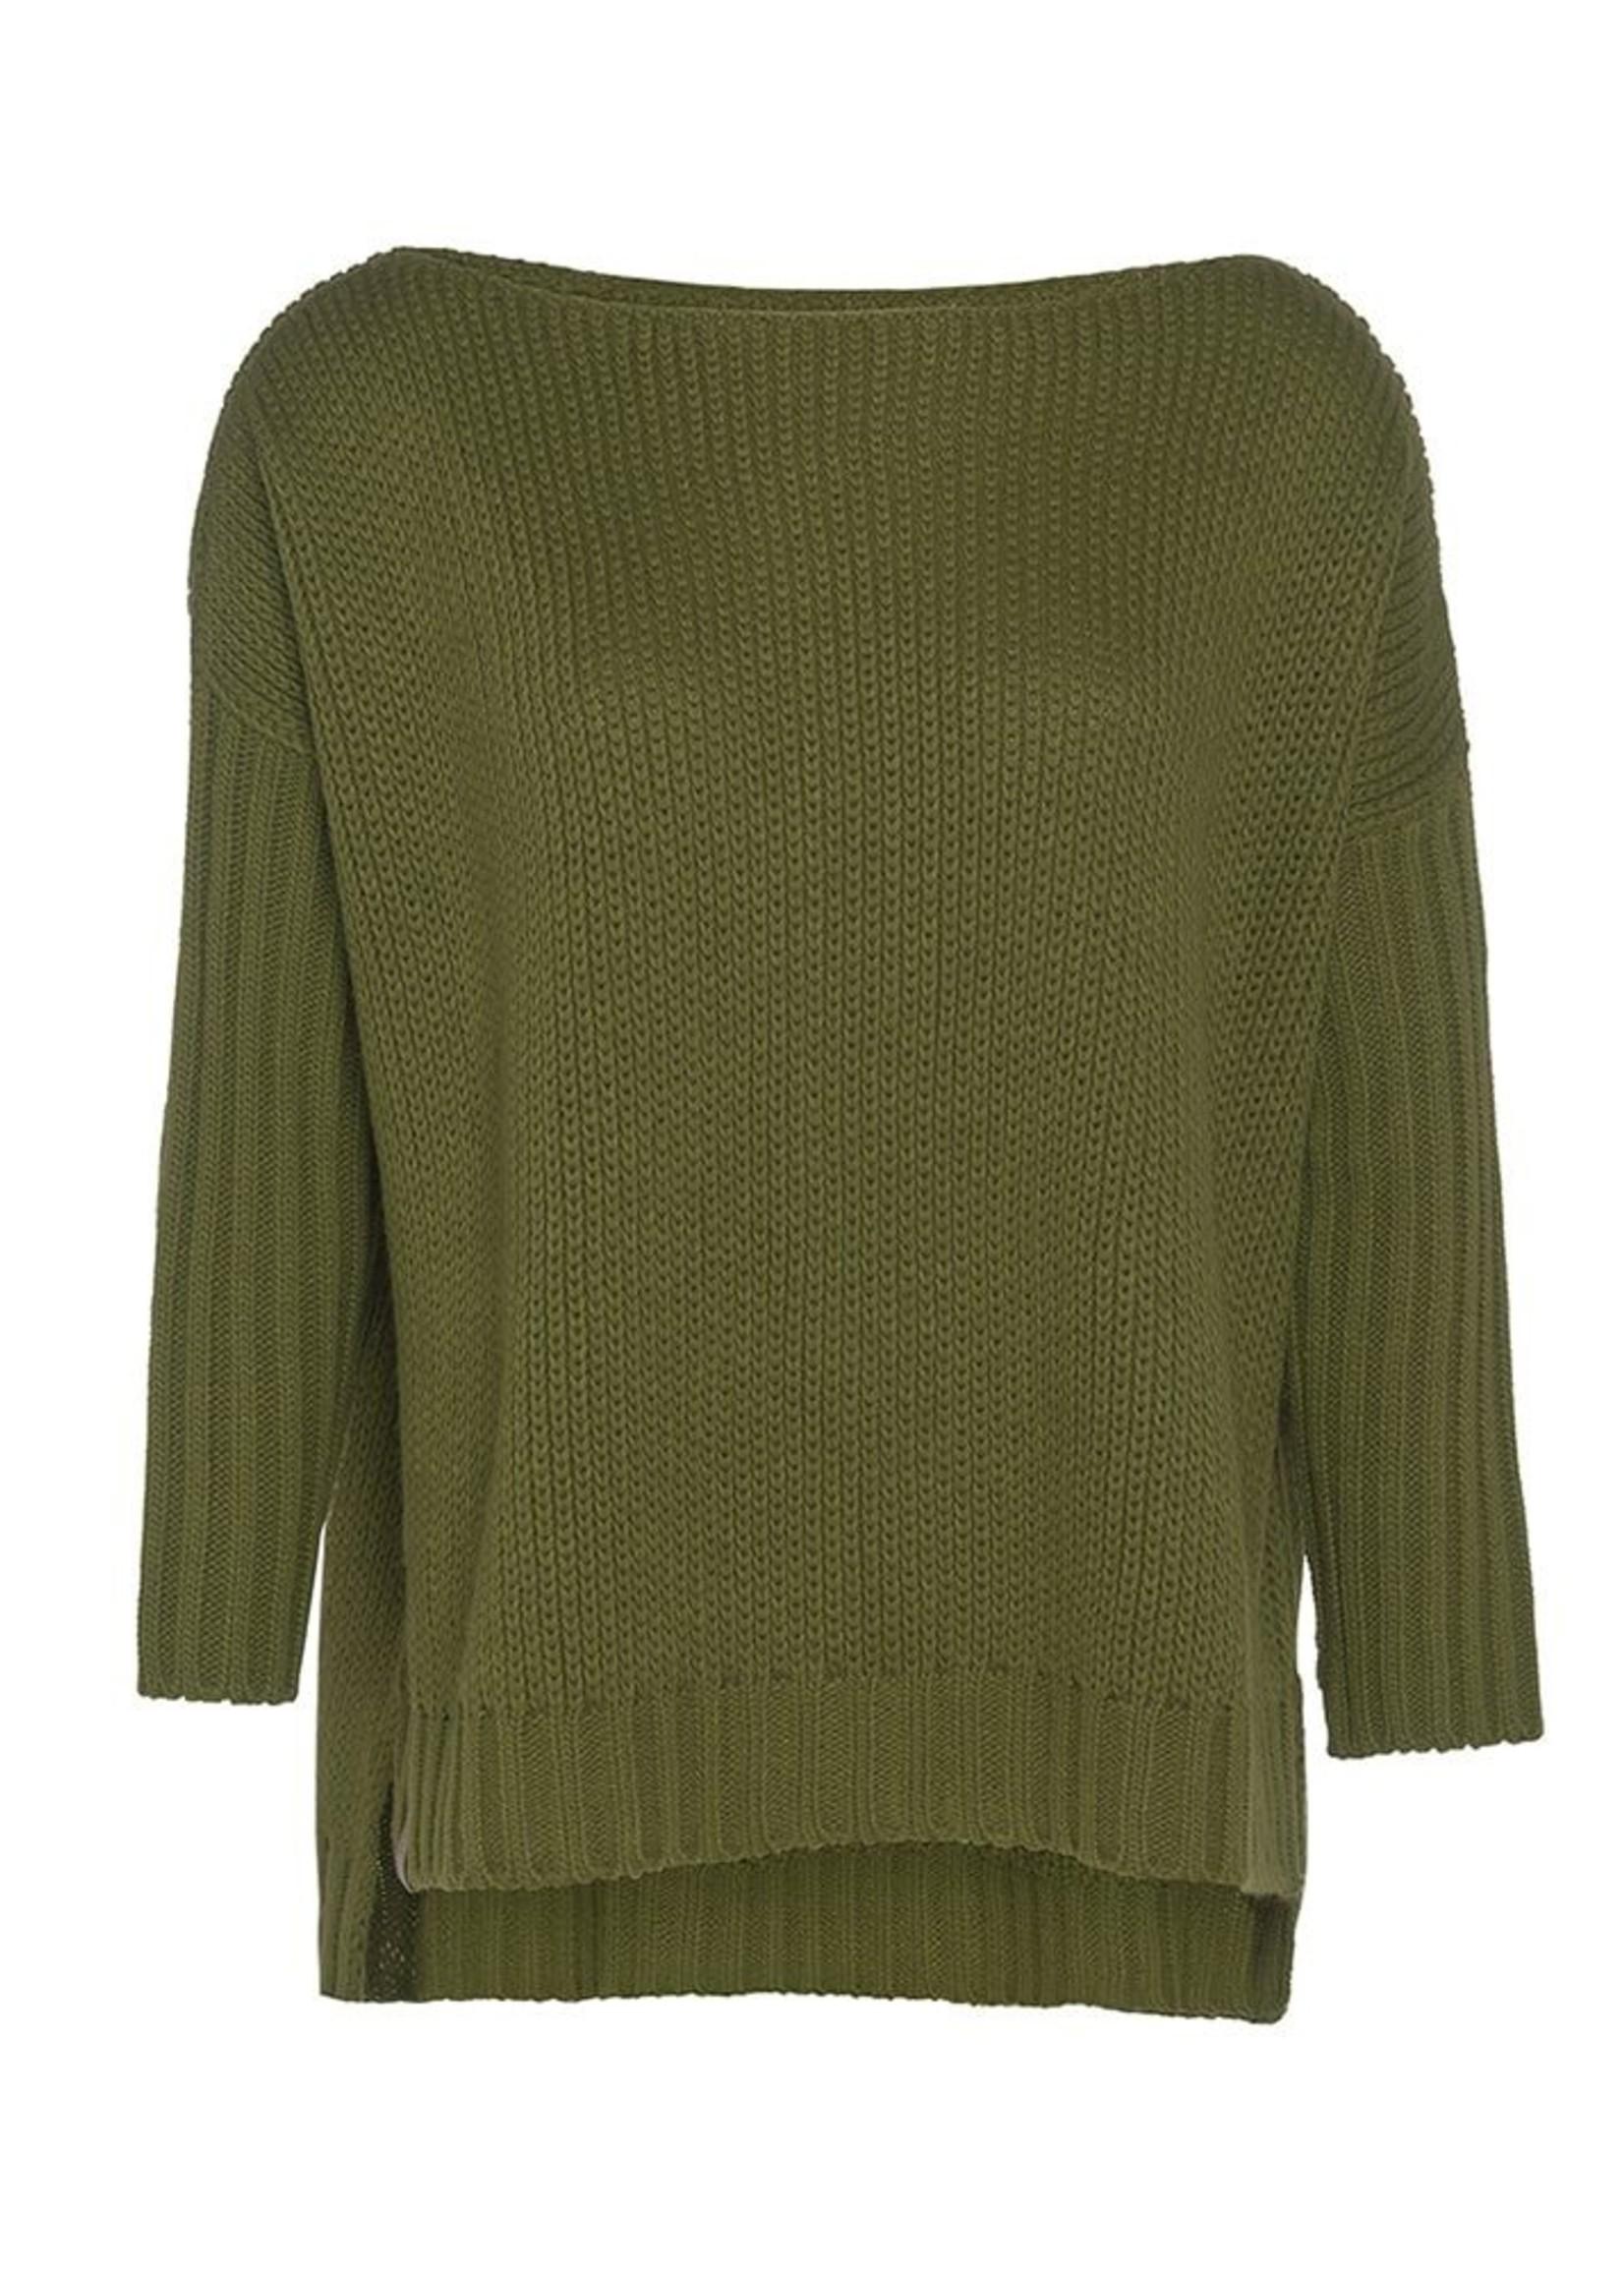 Knit Factory Knit Factory - Kylie Sweater Gebreid - Mos Groen